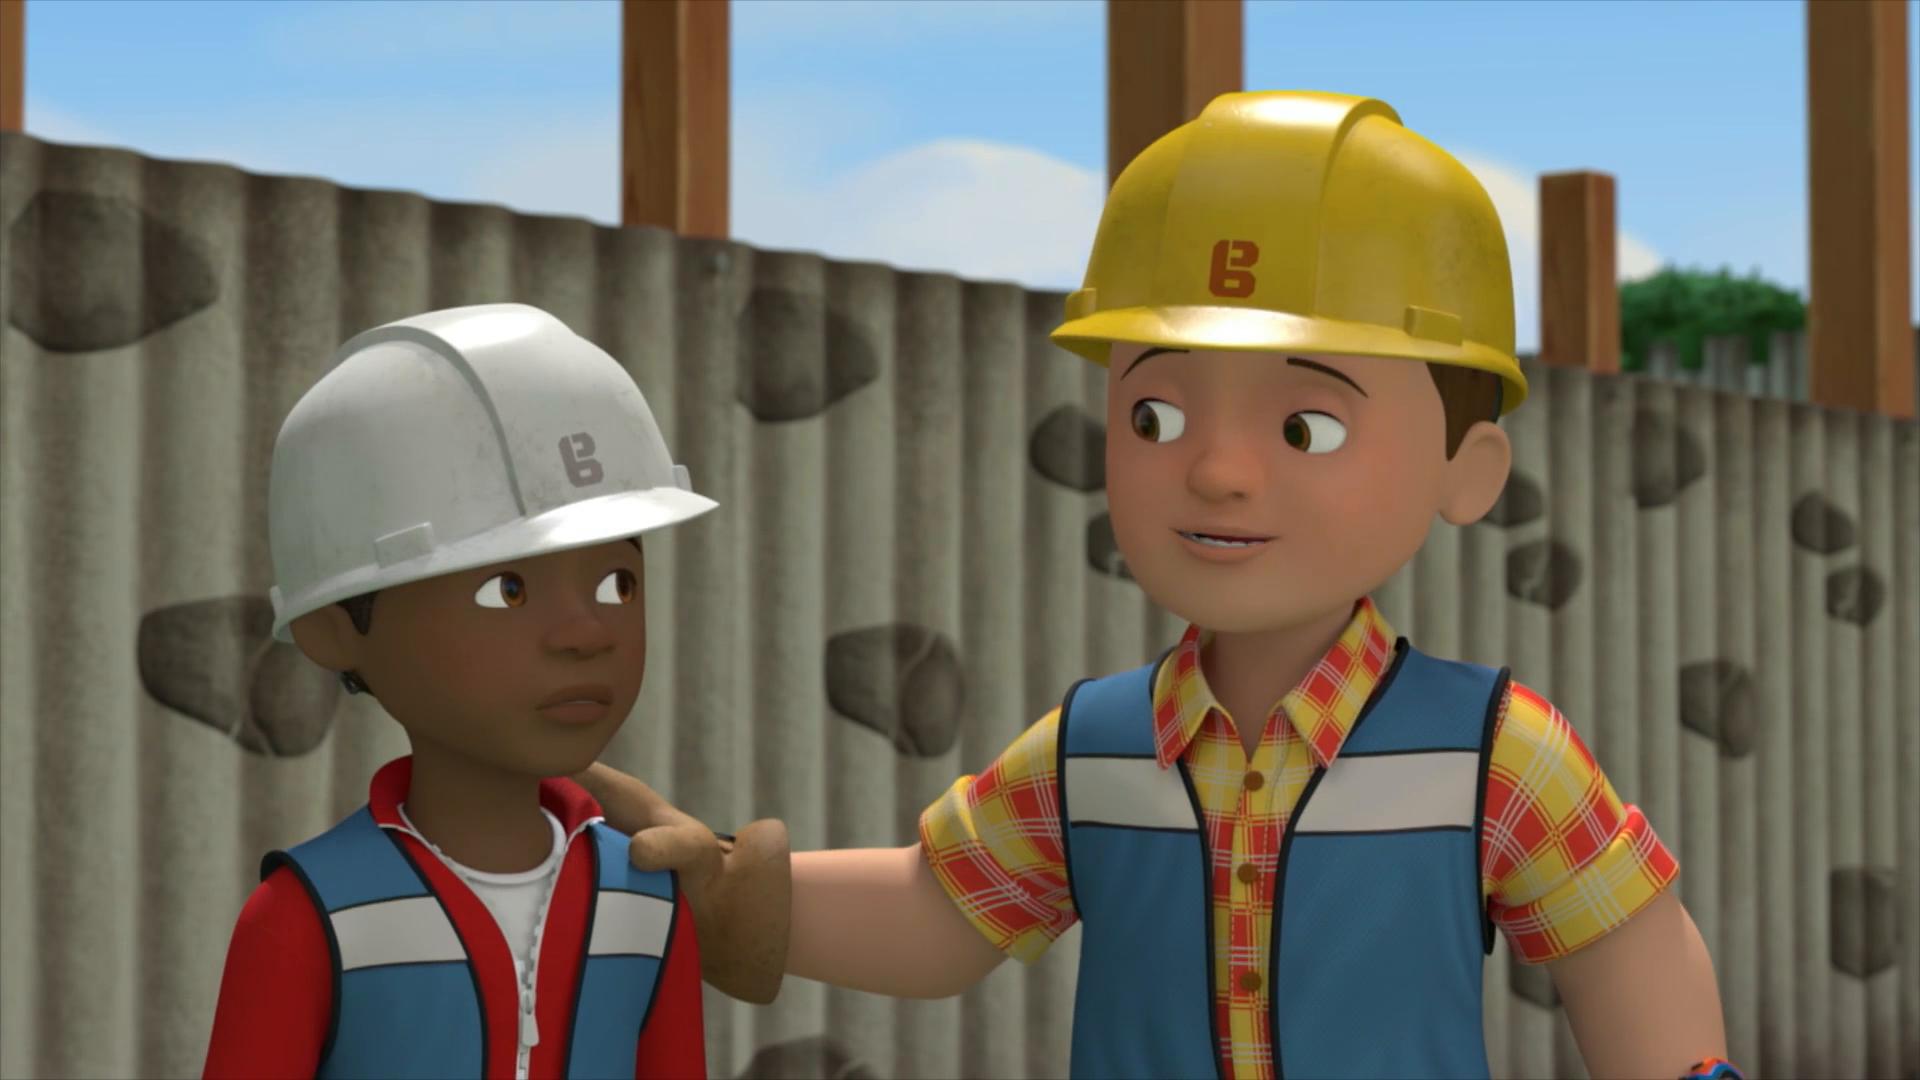 Bob the Builder - Season 3